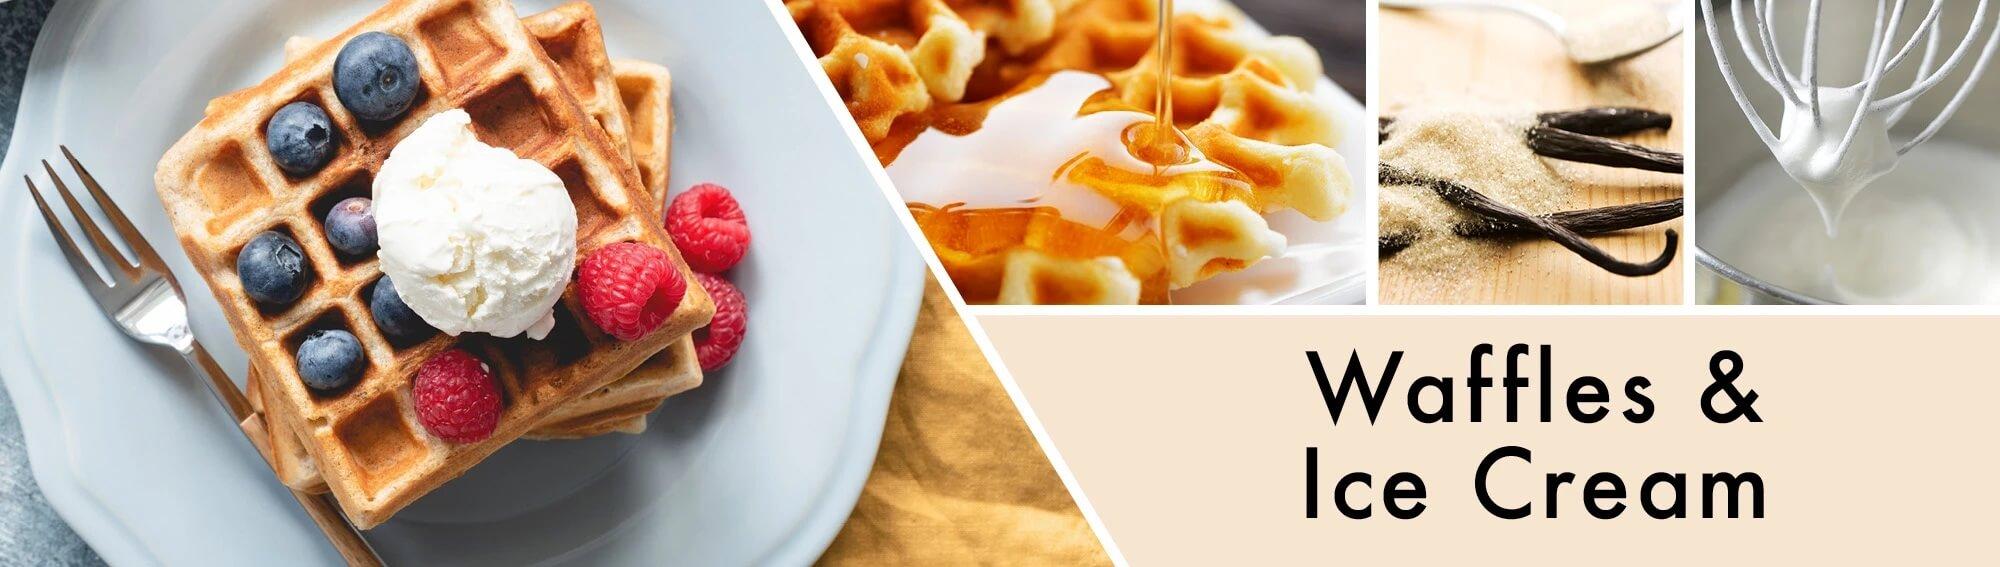 Waffles-Ice-Cream-Banner7eU90UcmnYDKW